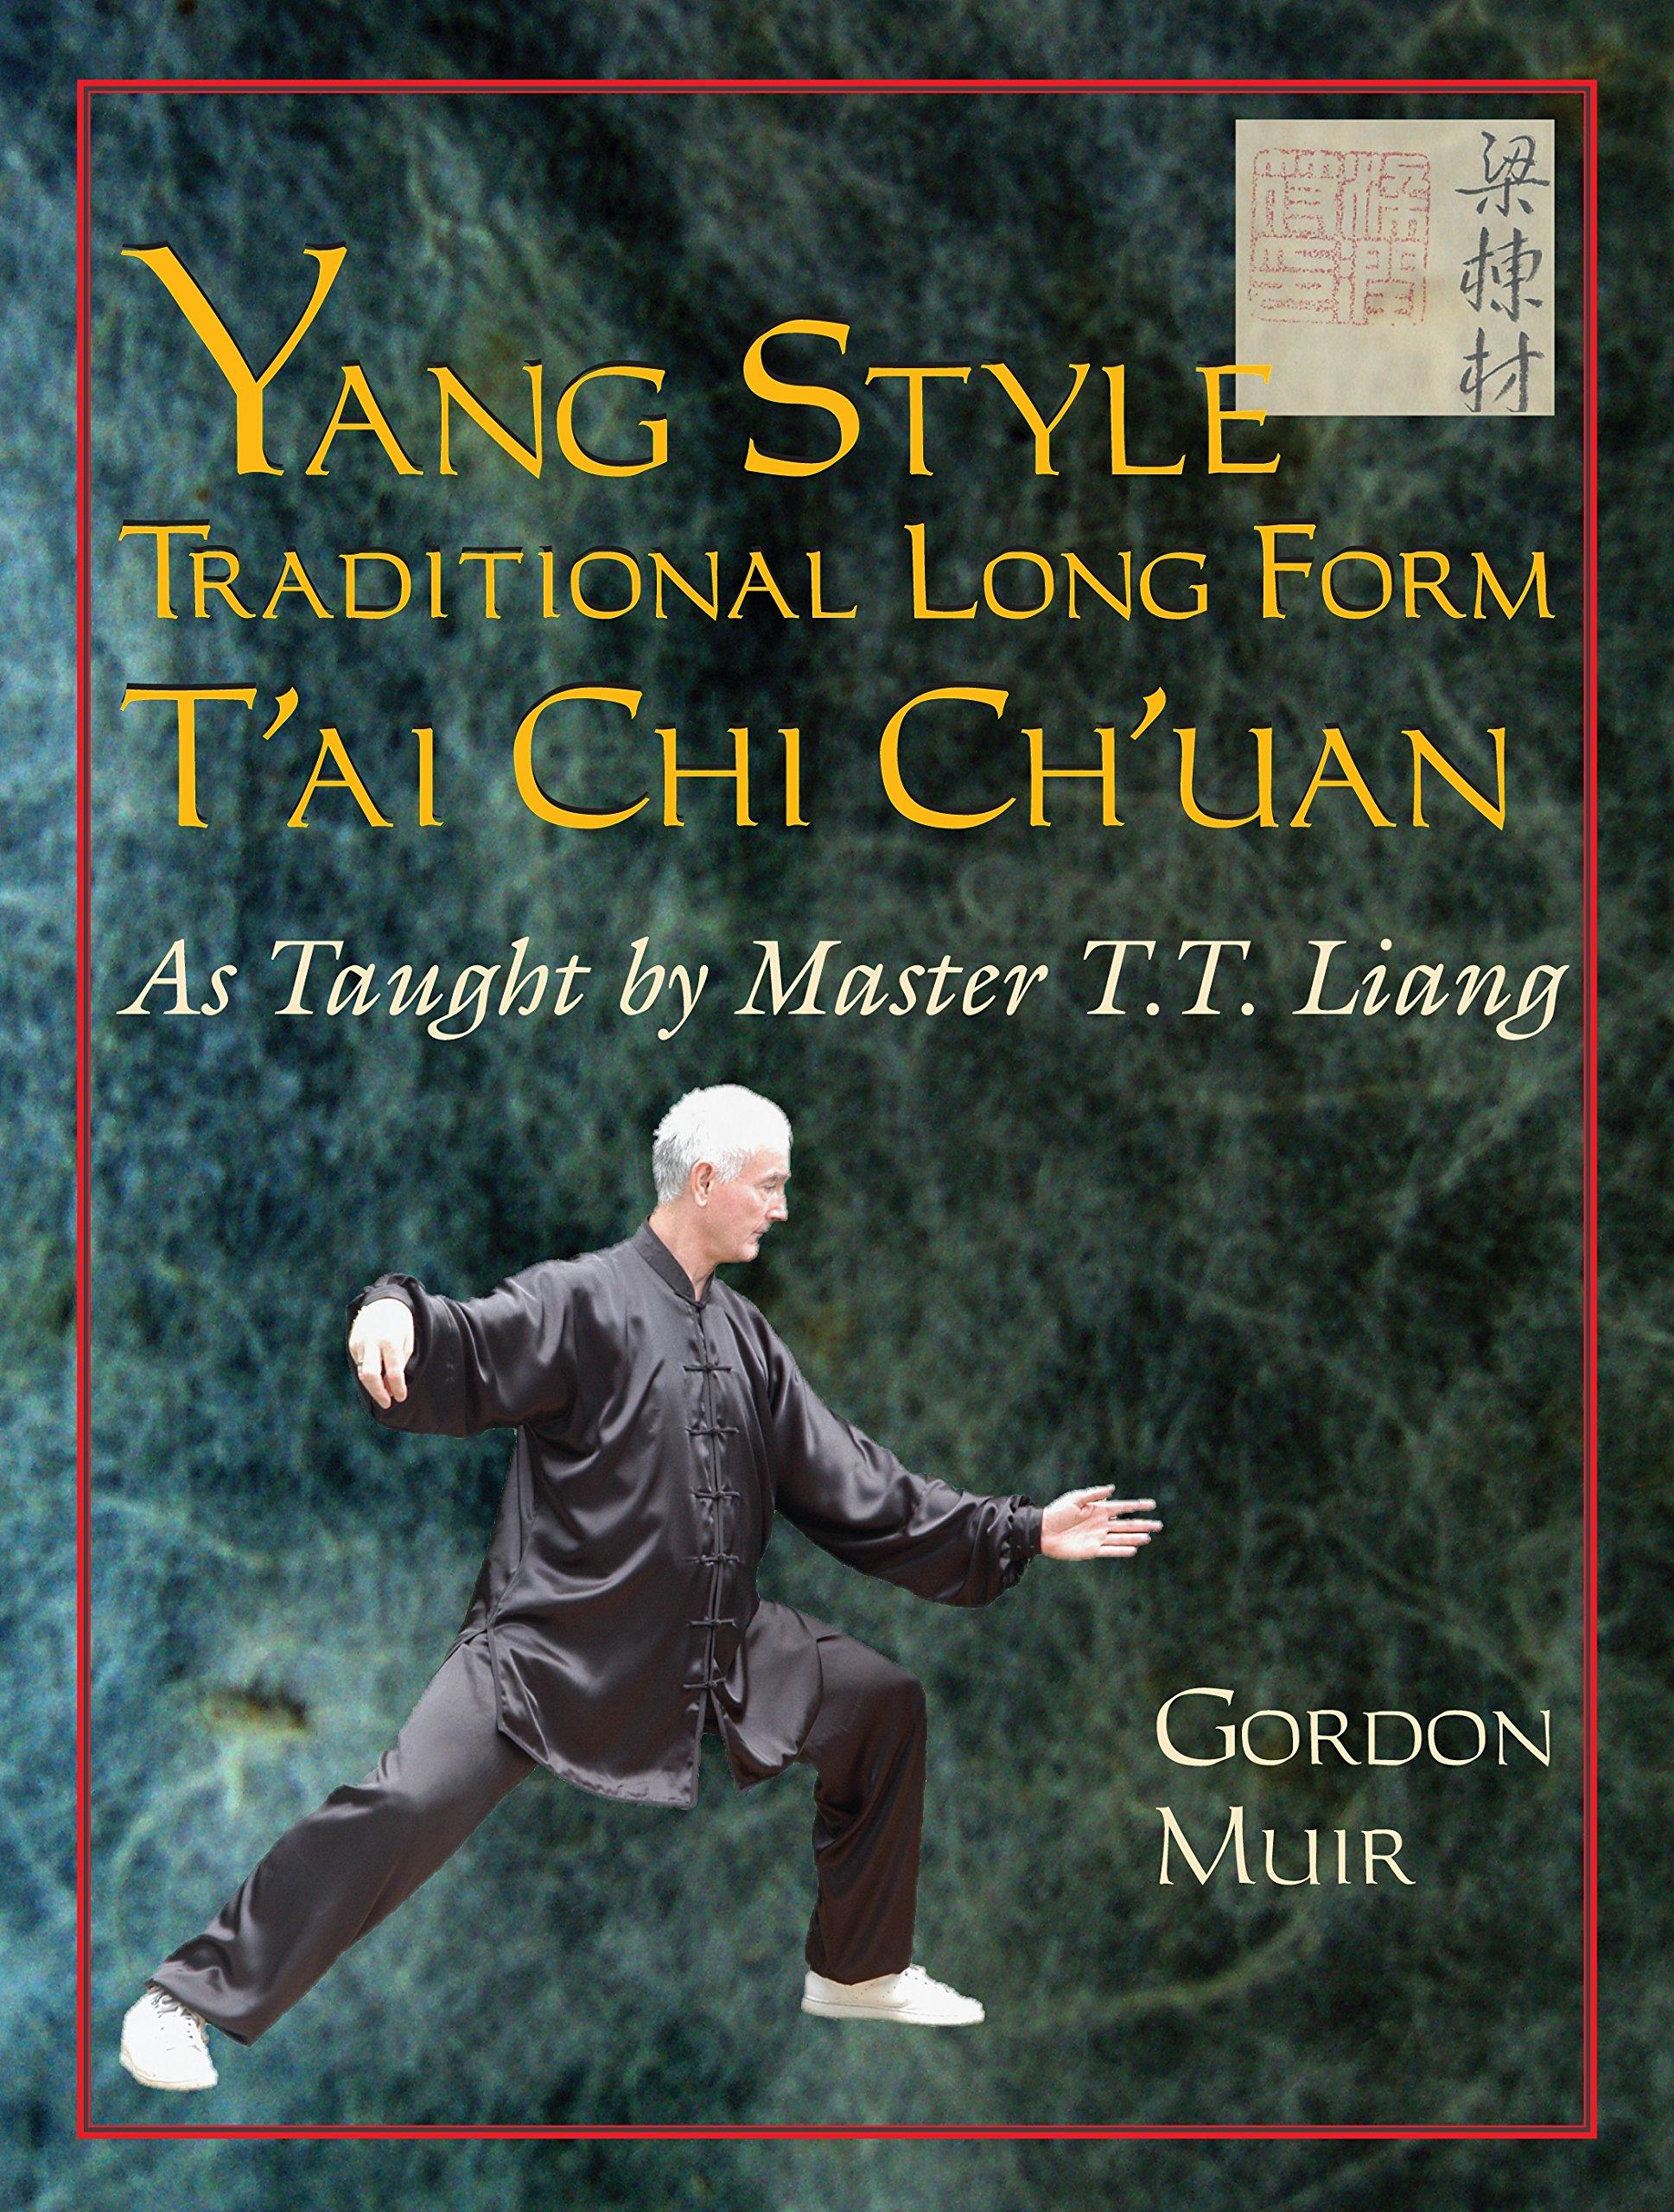 manual de chi kung pdf gratis